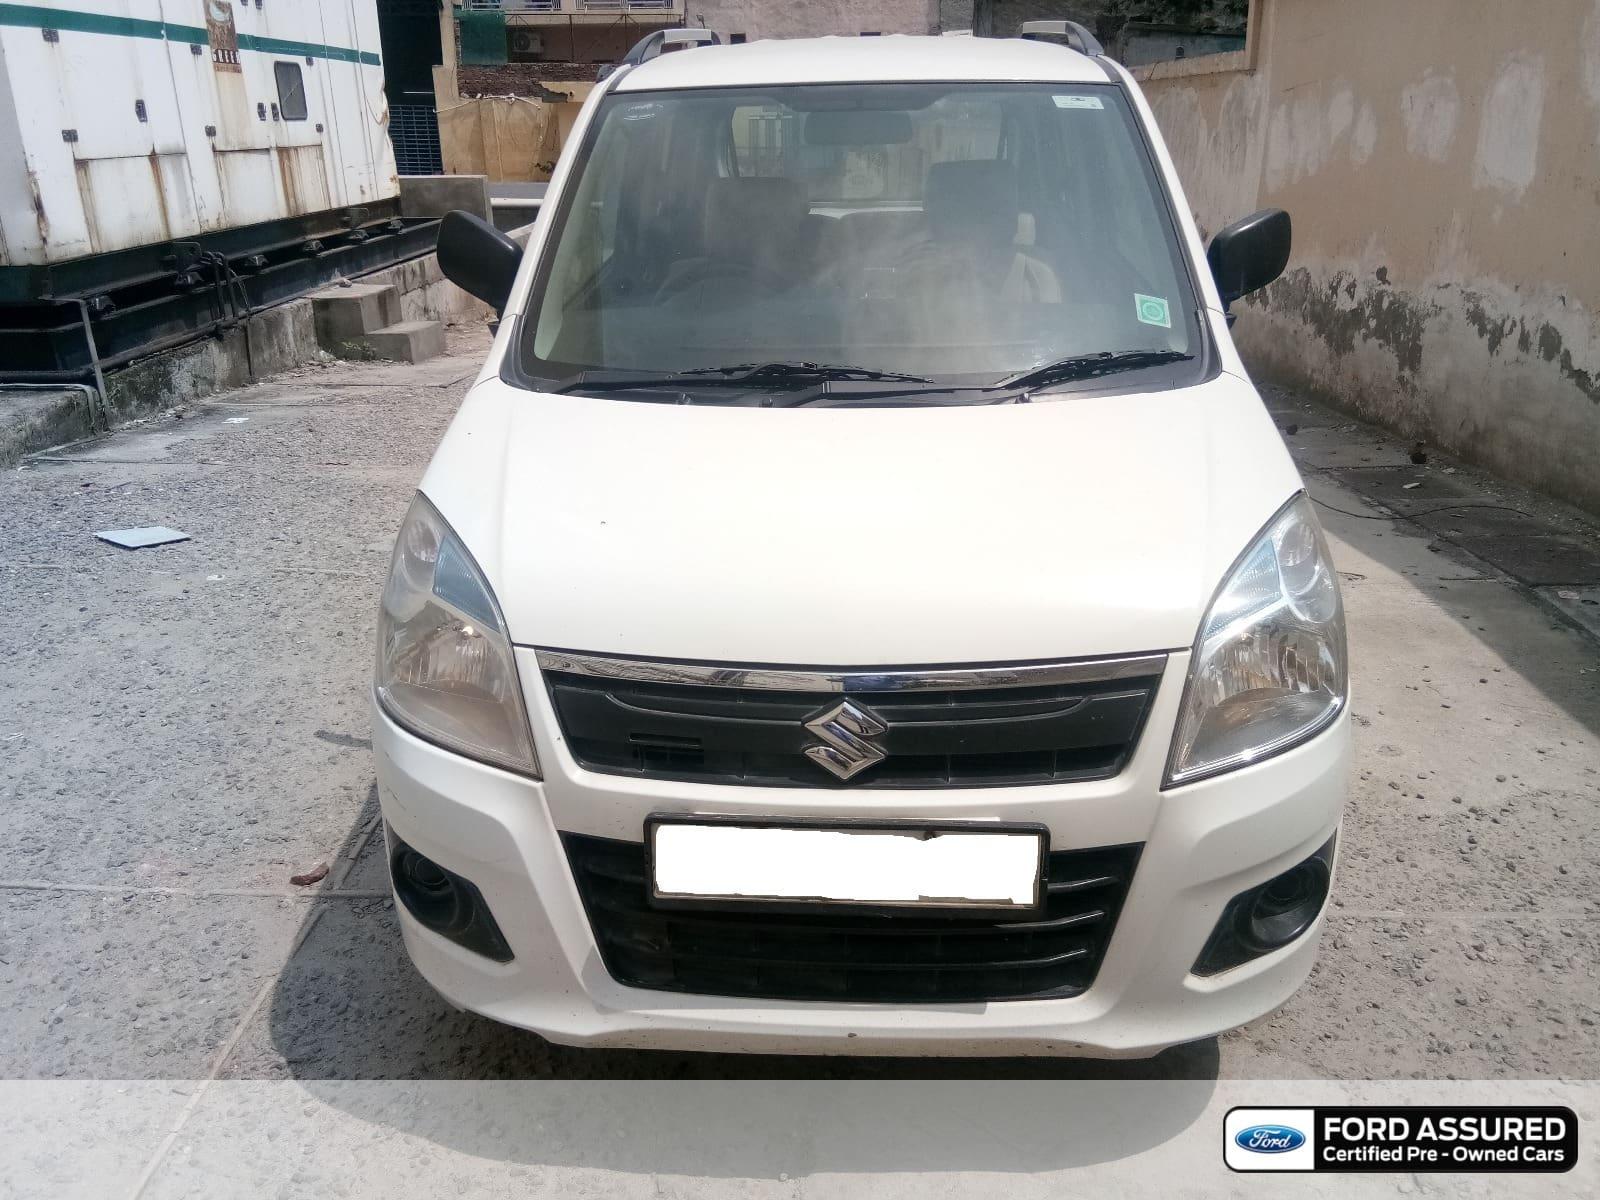 Maruti Wagon R LXI CNG Avance Edition